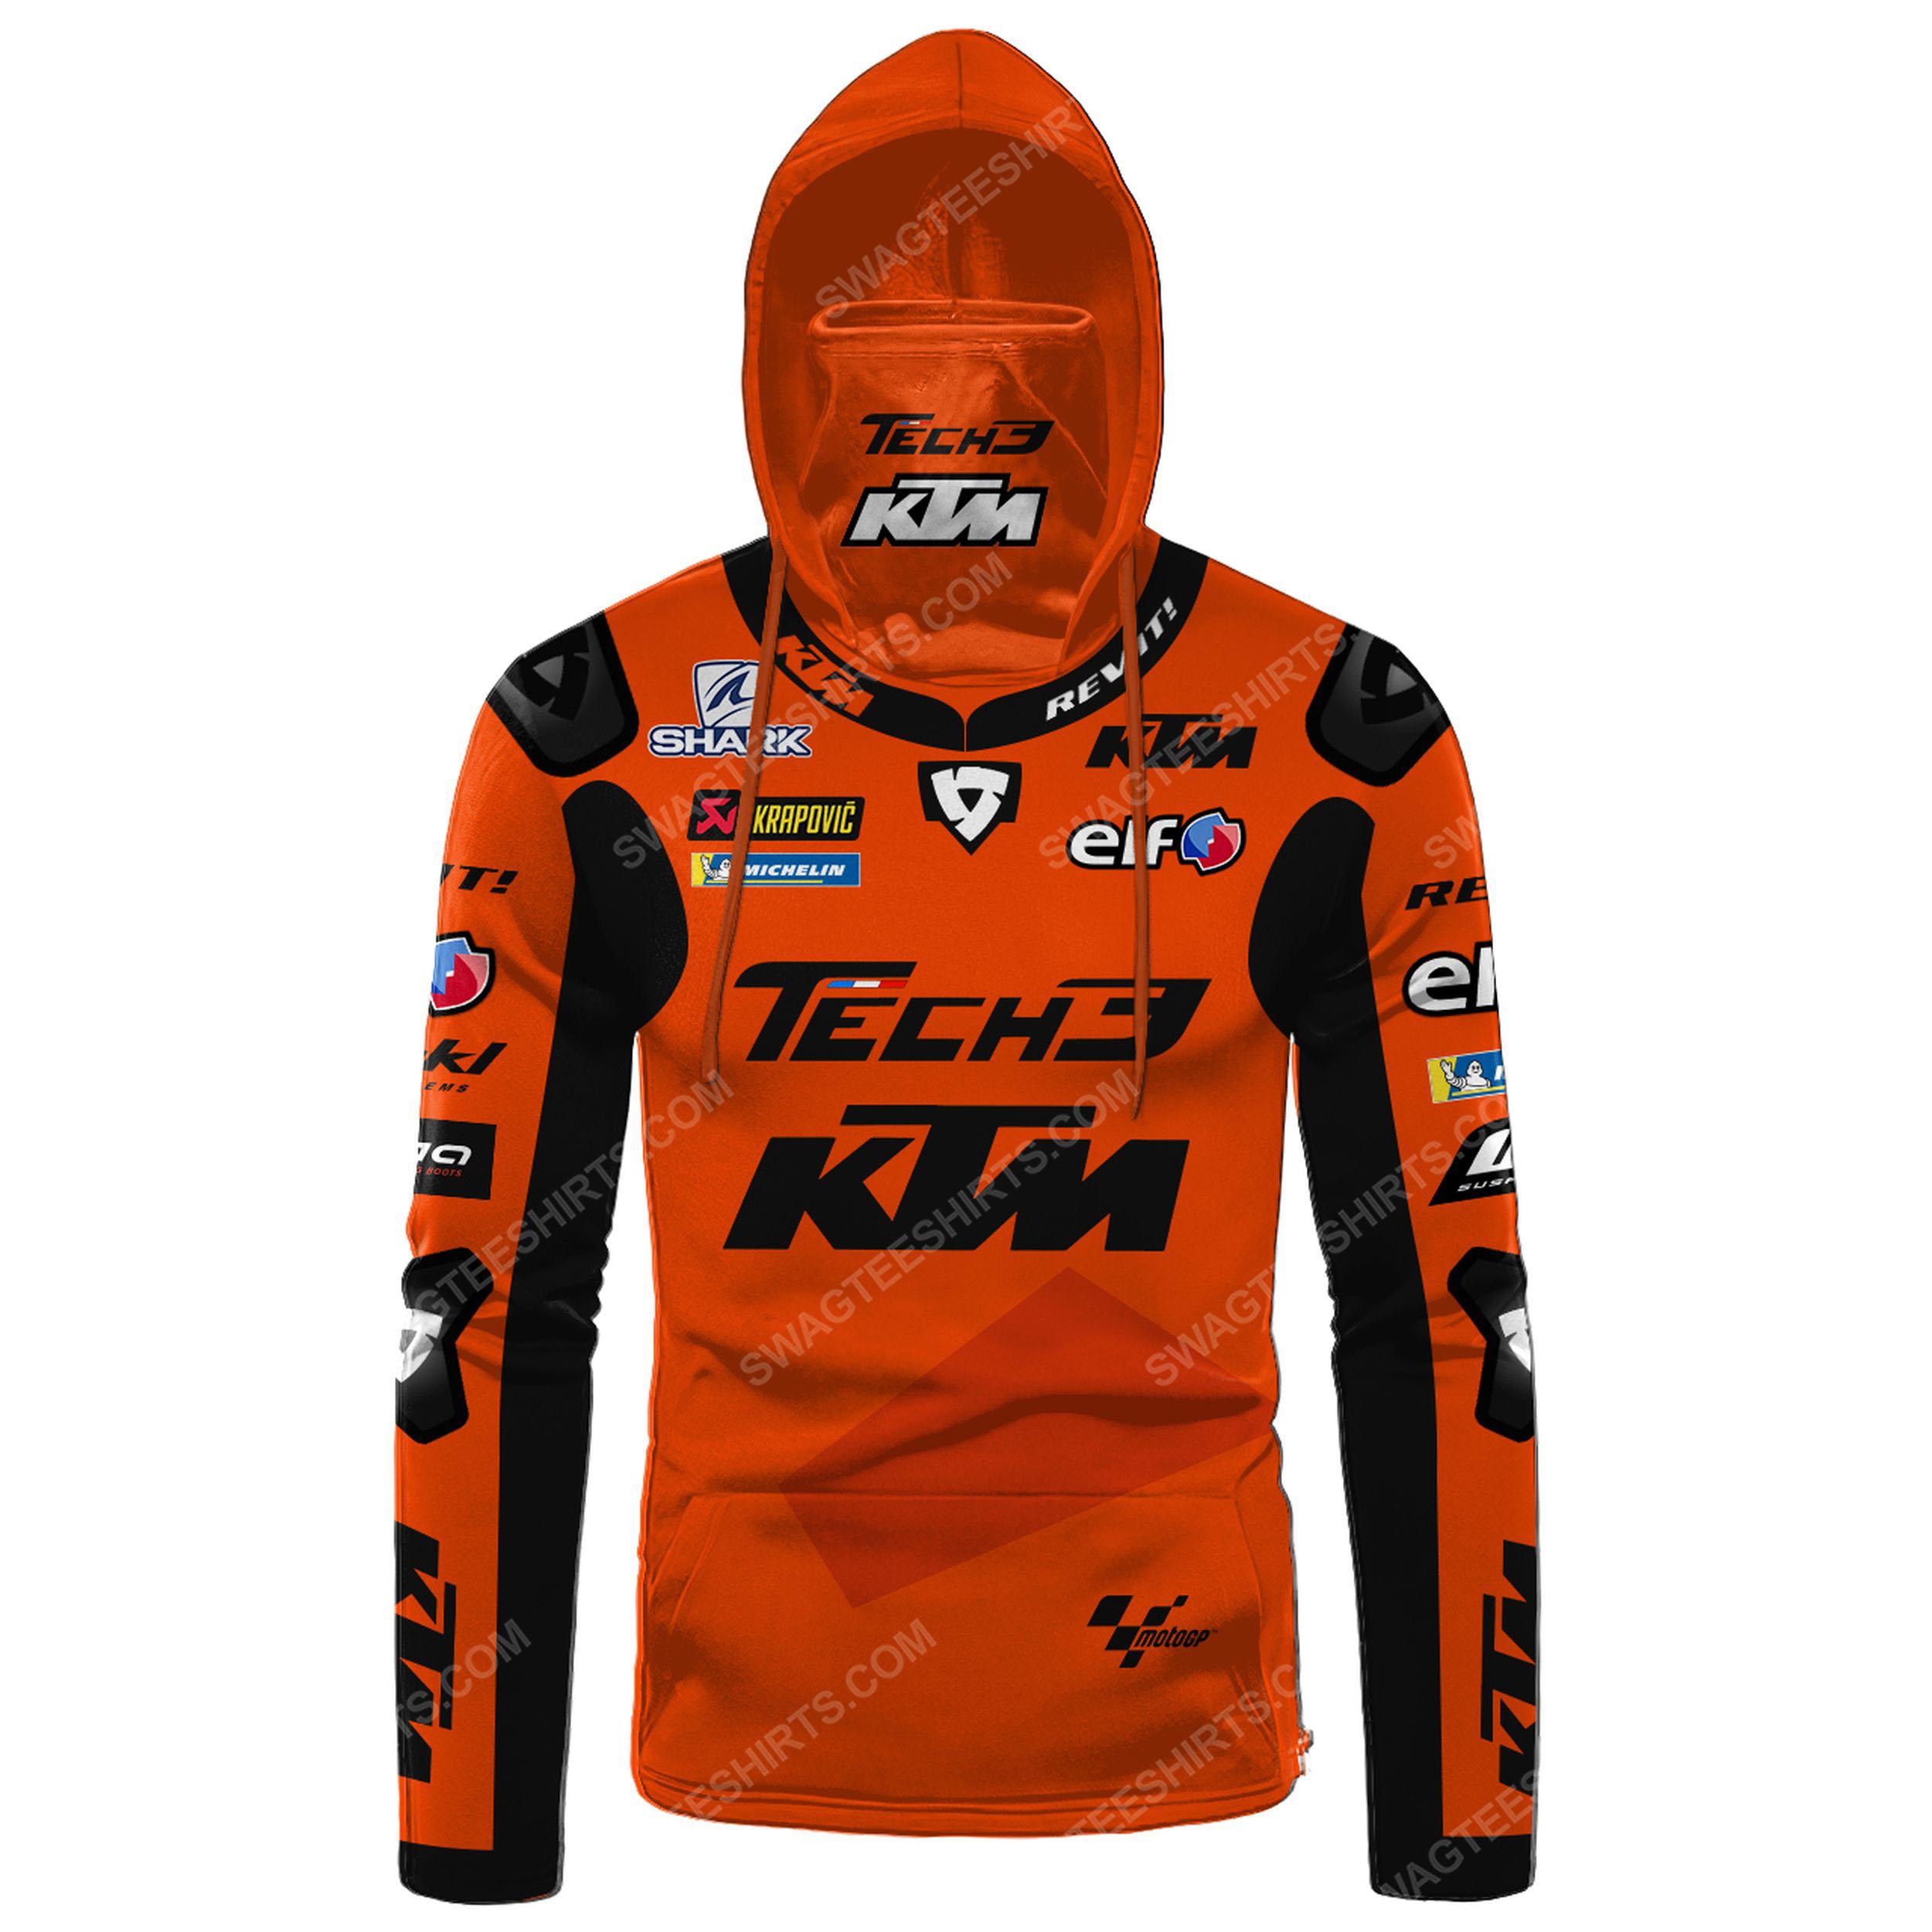 Custom name tech3 ktm factory racing full print mask hoodie 2(1) - Copy